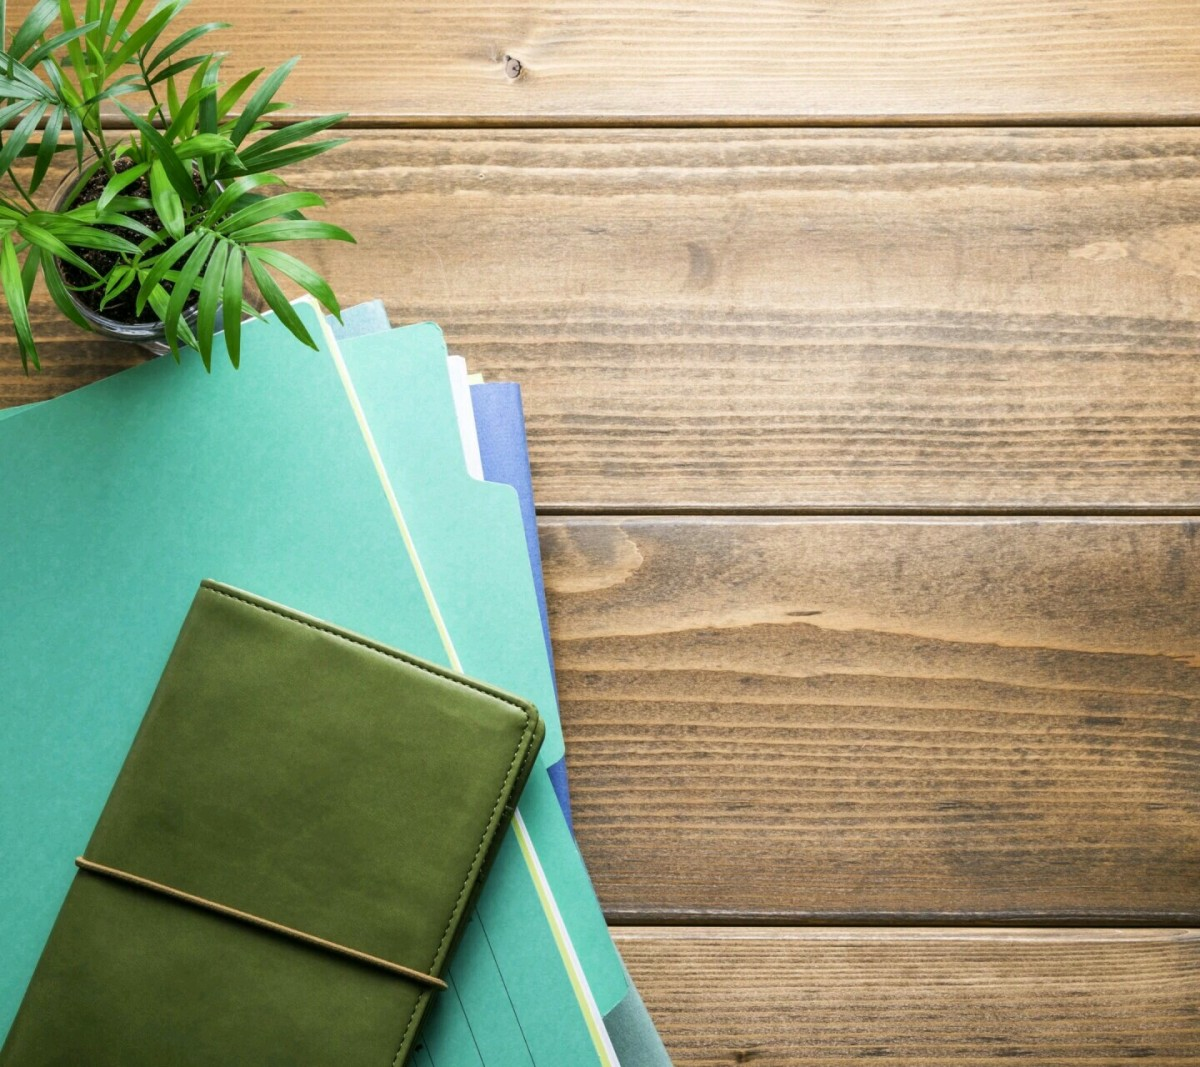 Bullet Journaling: A Step Towards a Productive Life